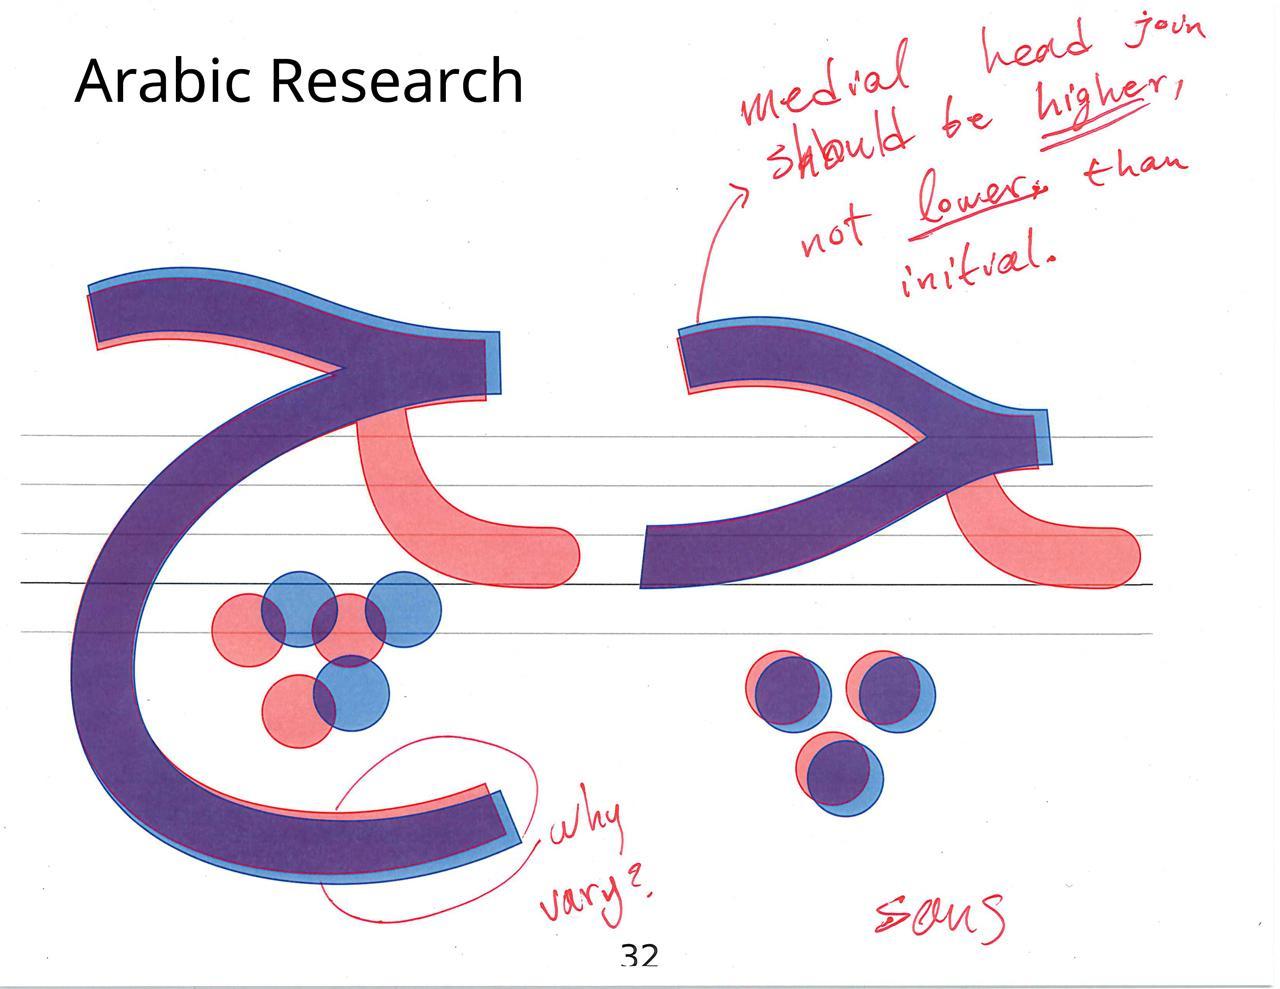 arabicresearch